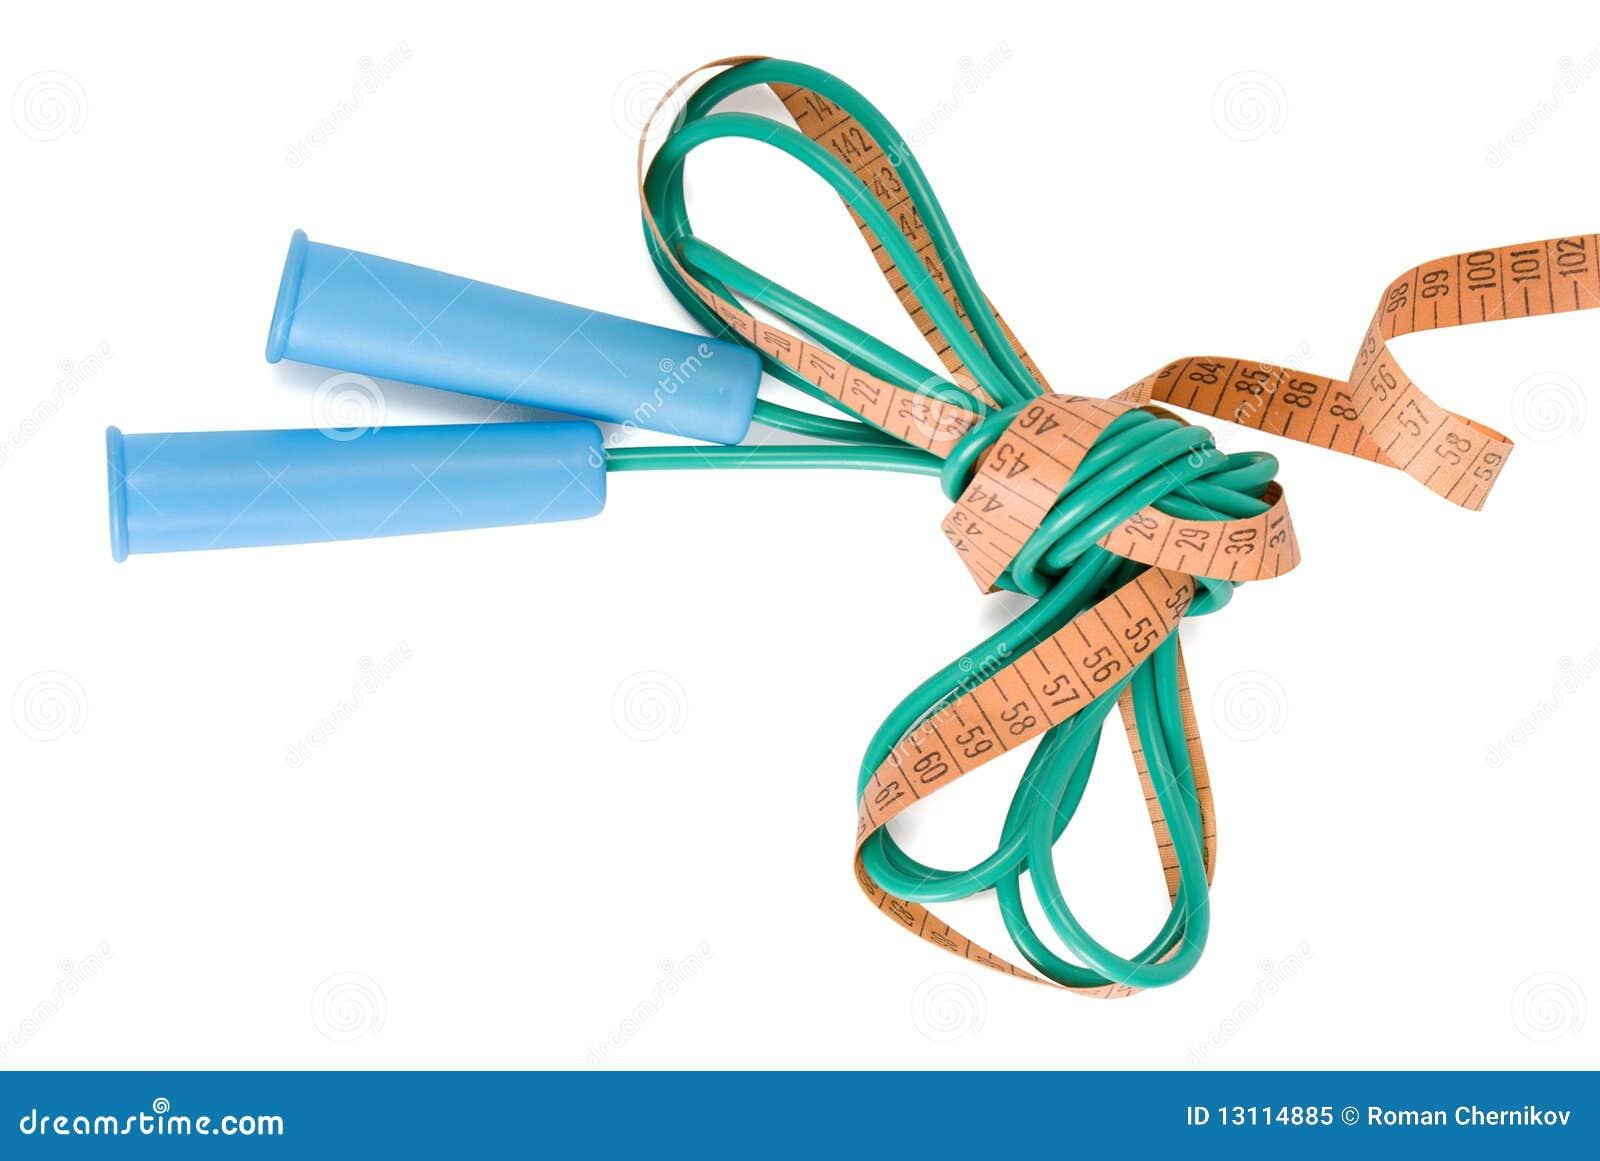 Saltar-cuerda